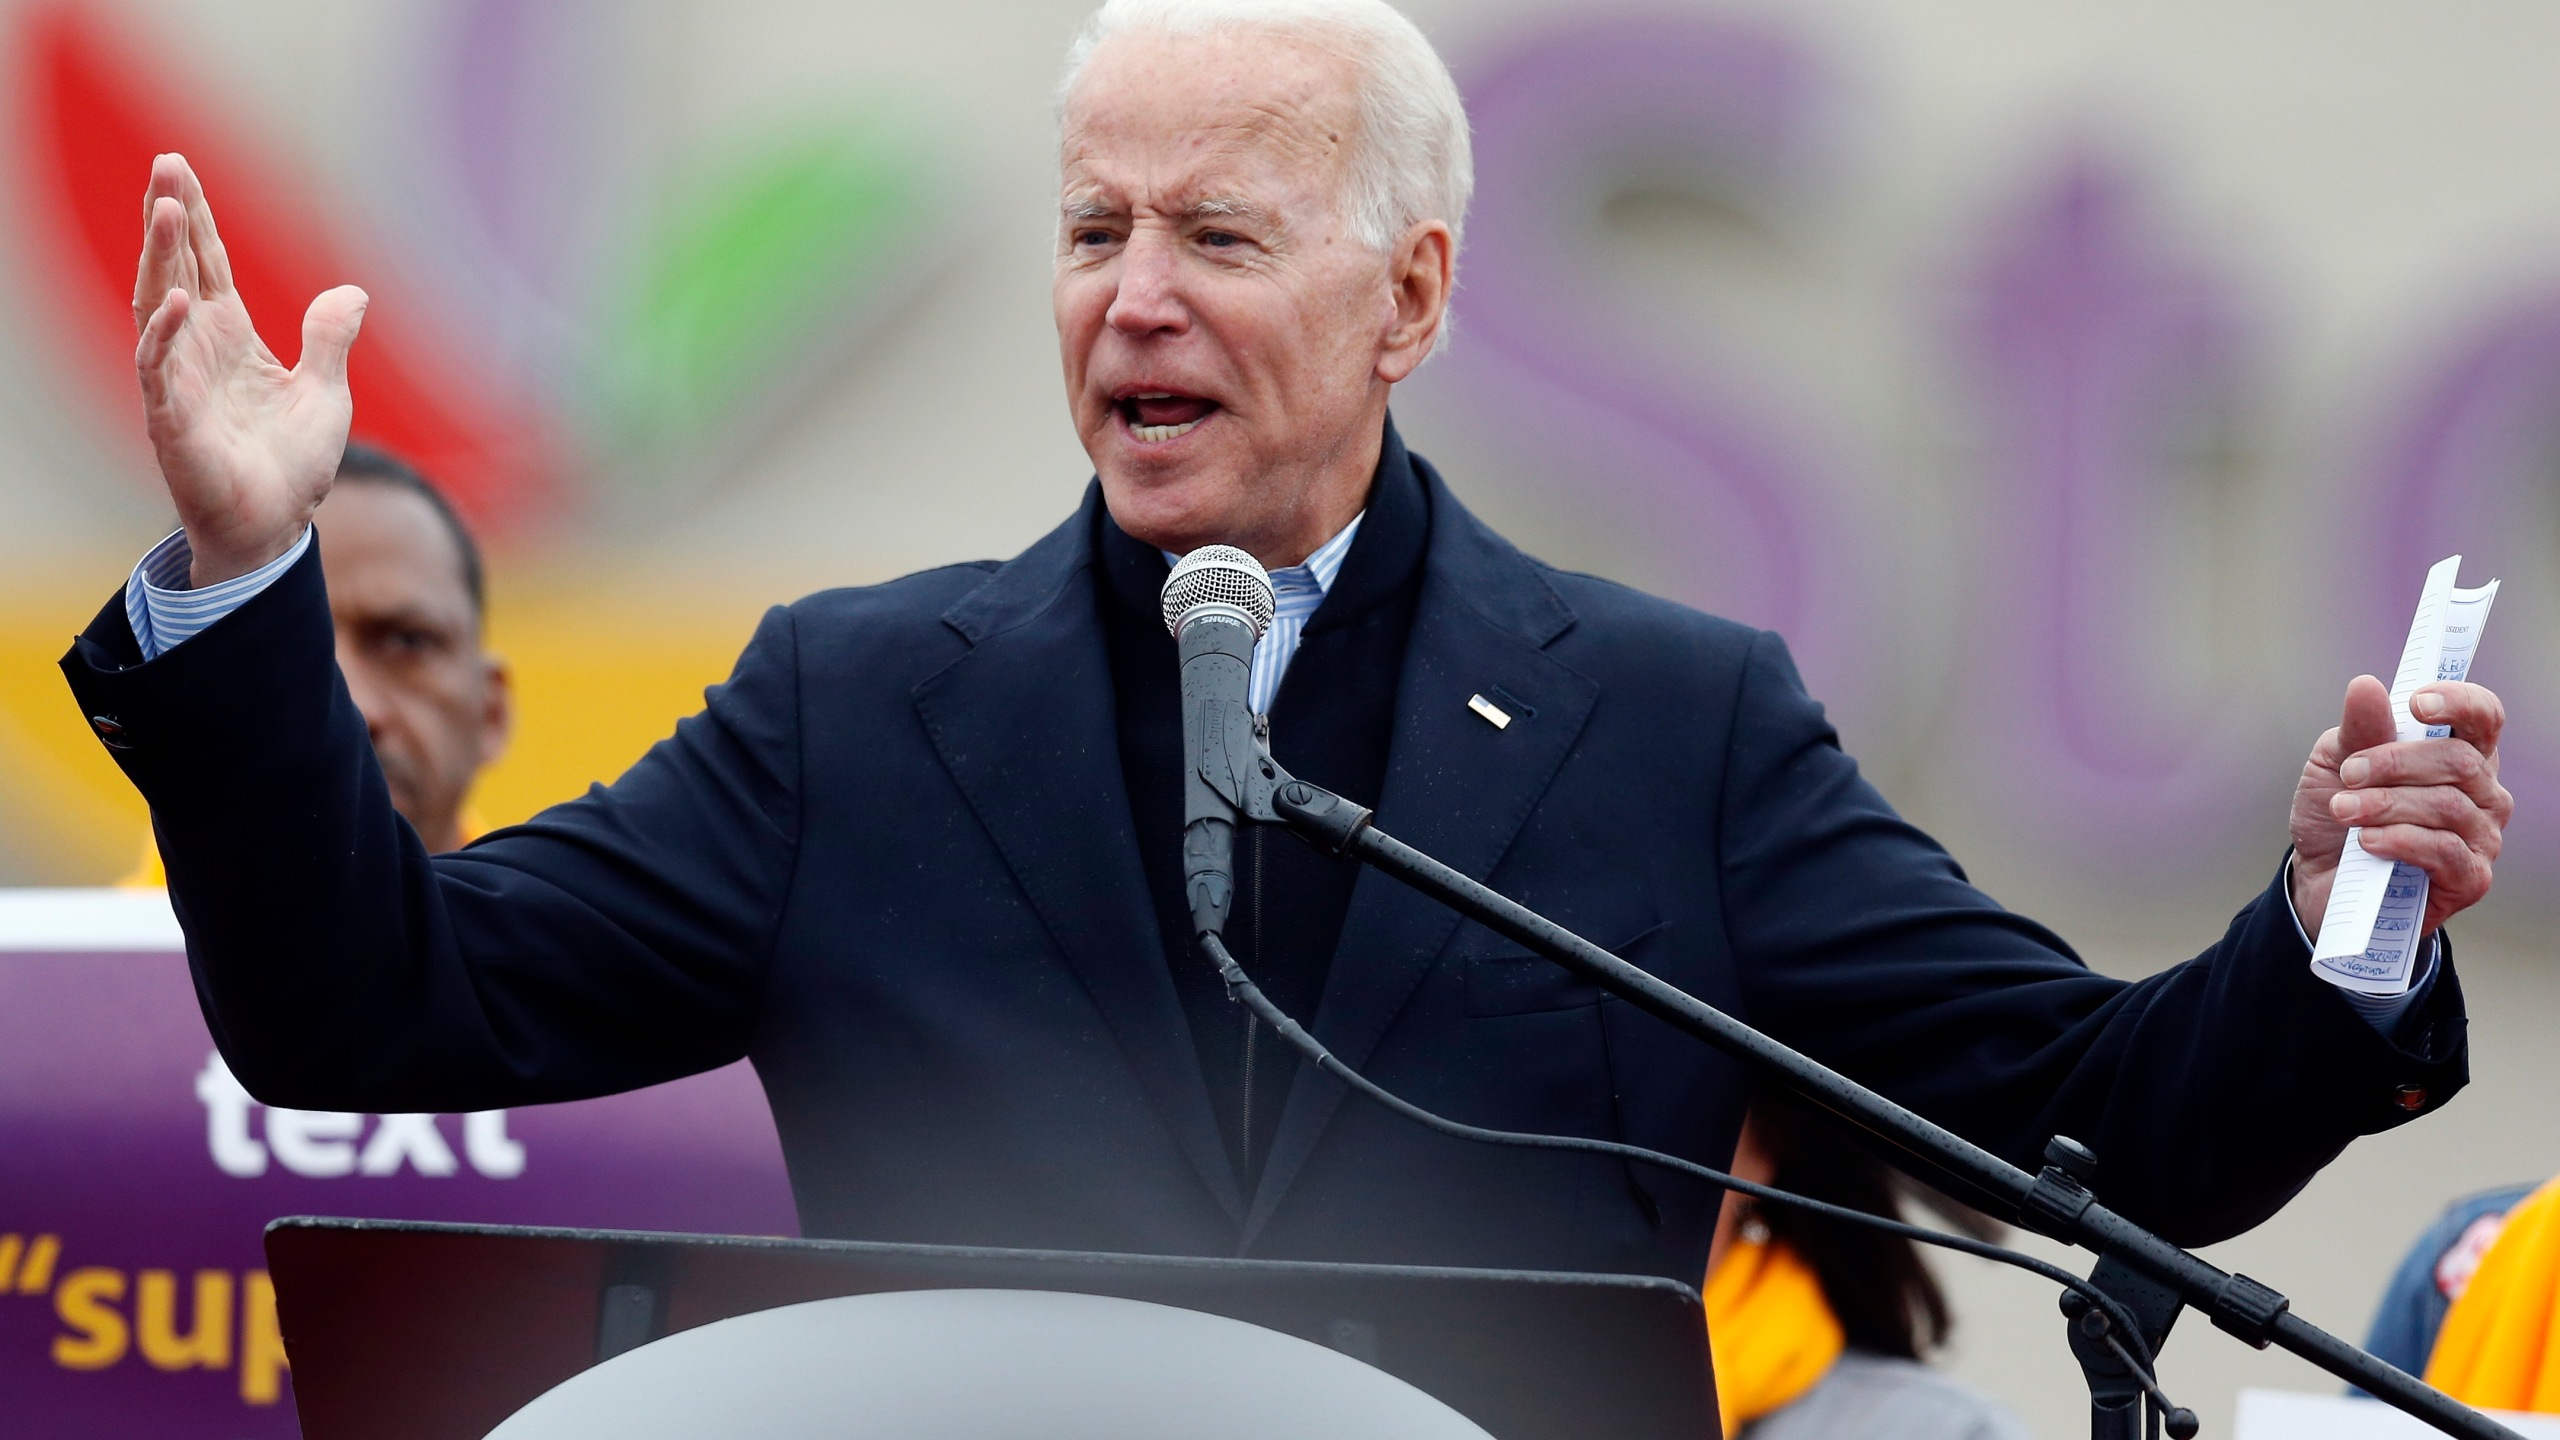 Election_2020_Joe_Biden_40031-159532.jpg82241326